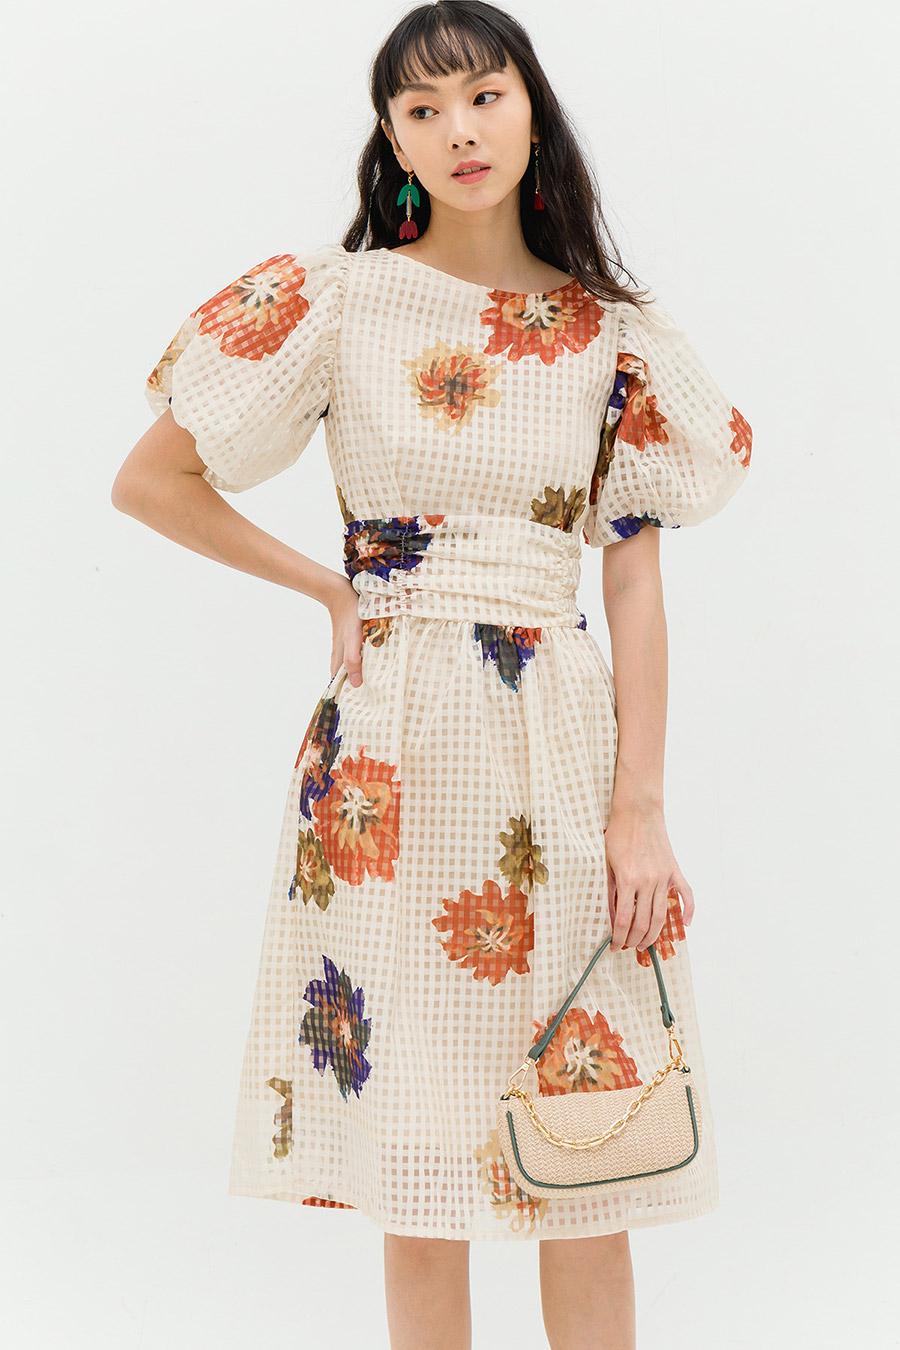 HARMONY DRESS - GINGHAM FLEUR